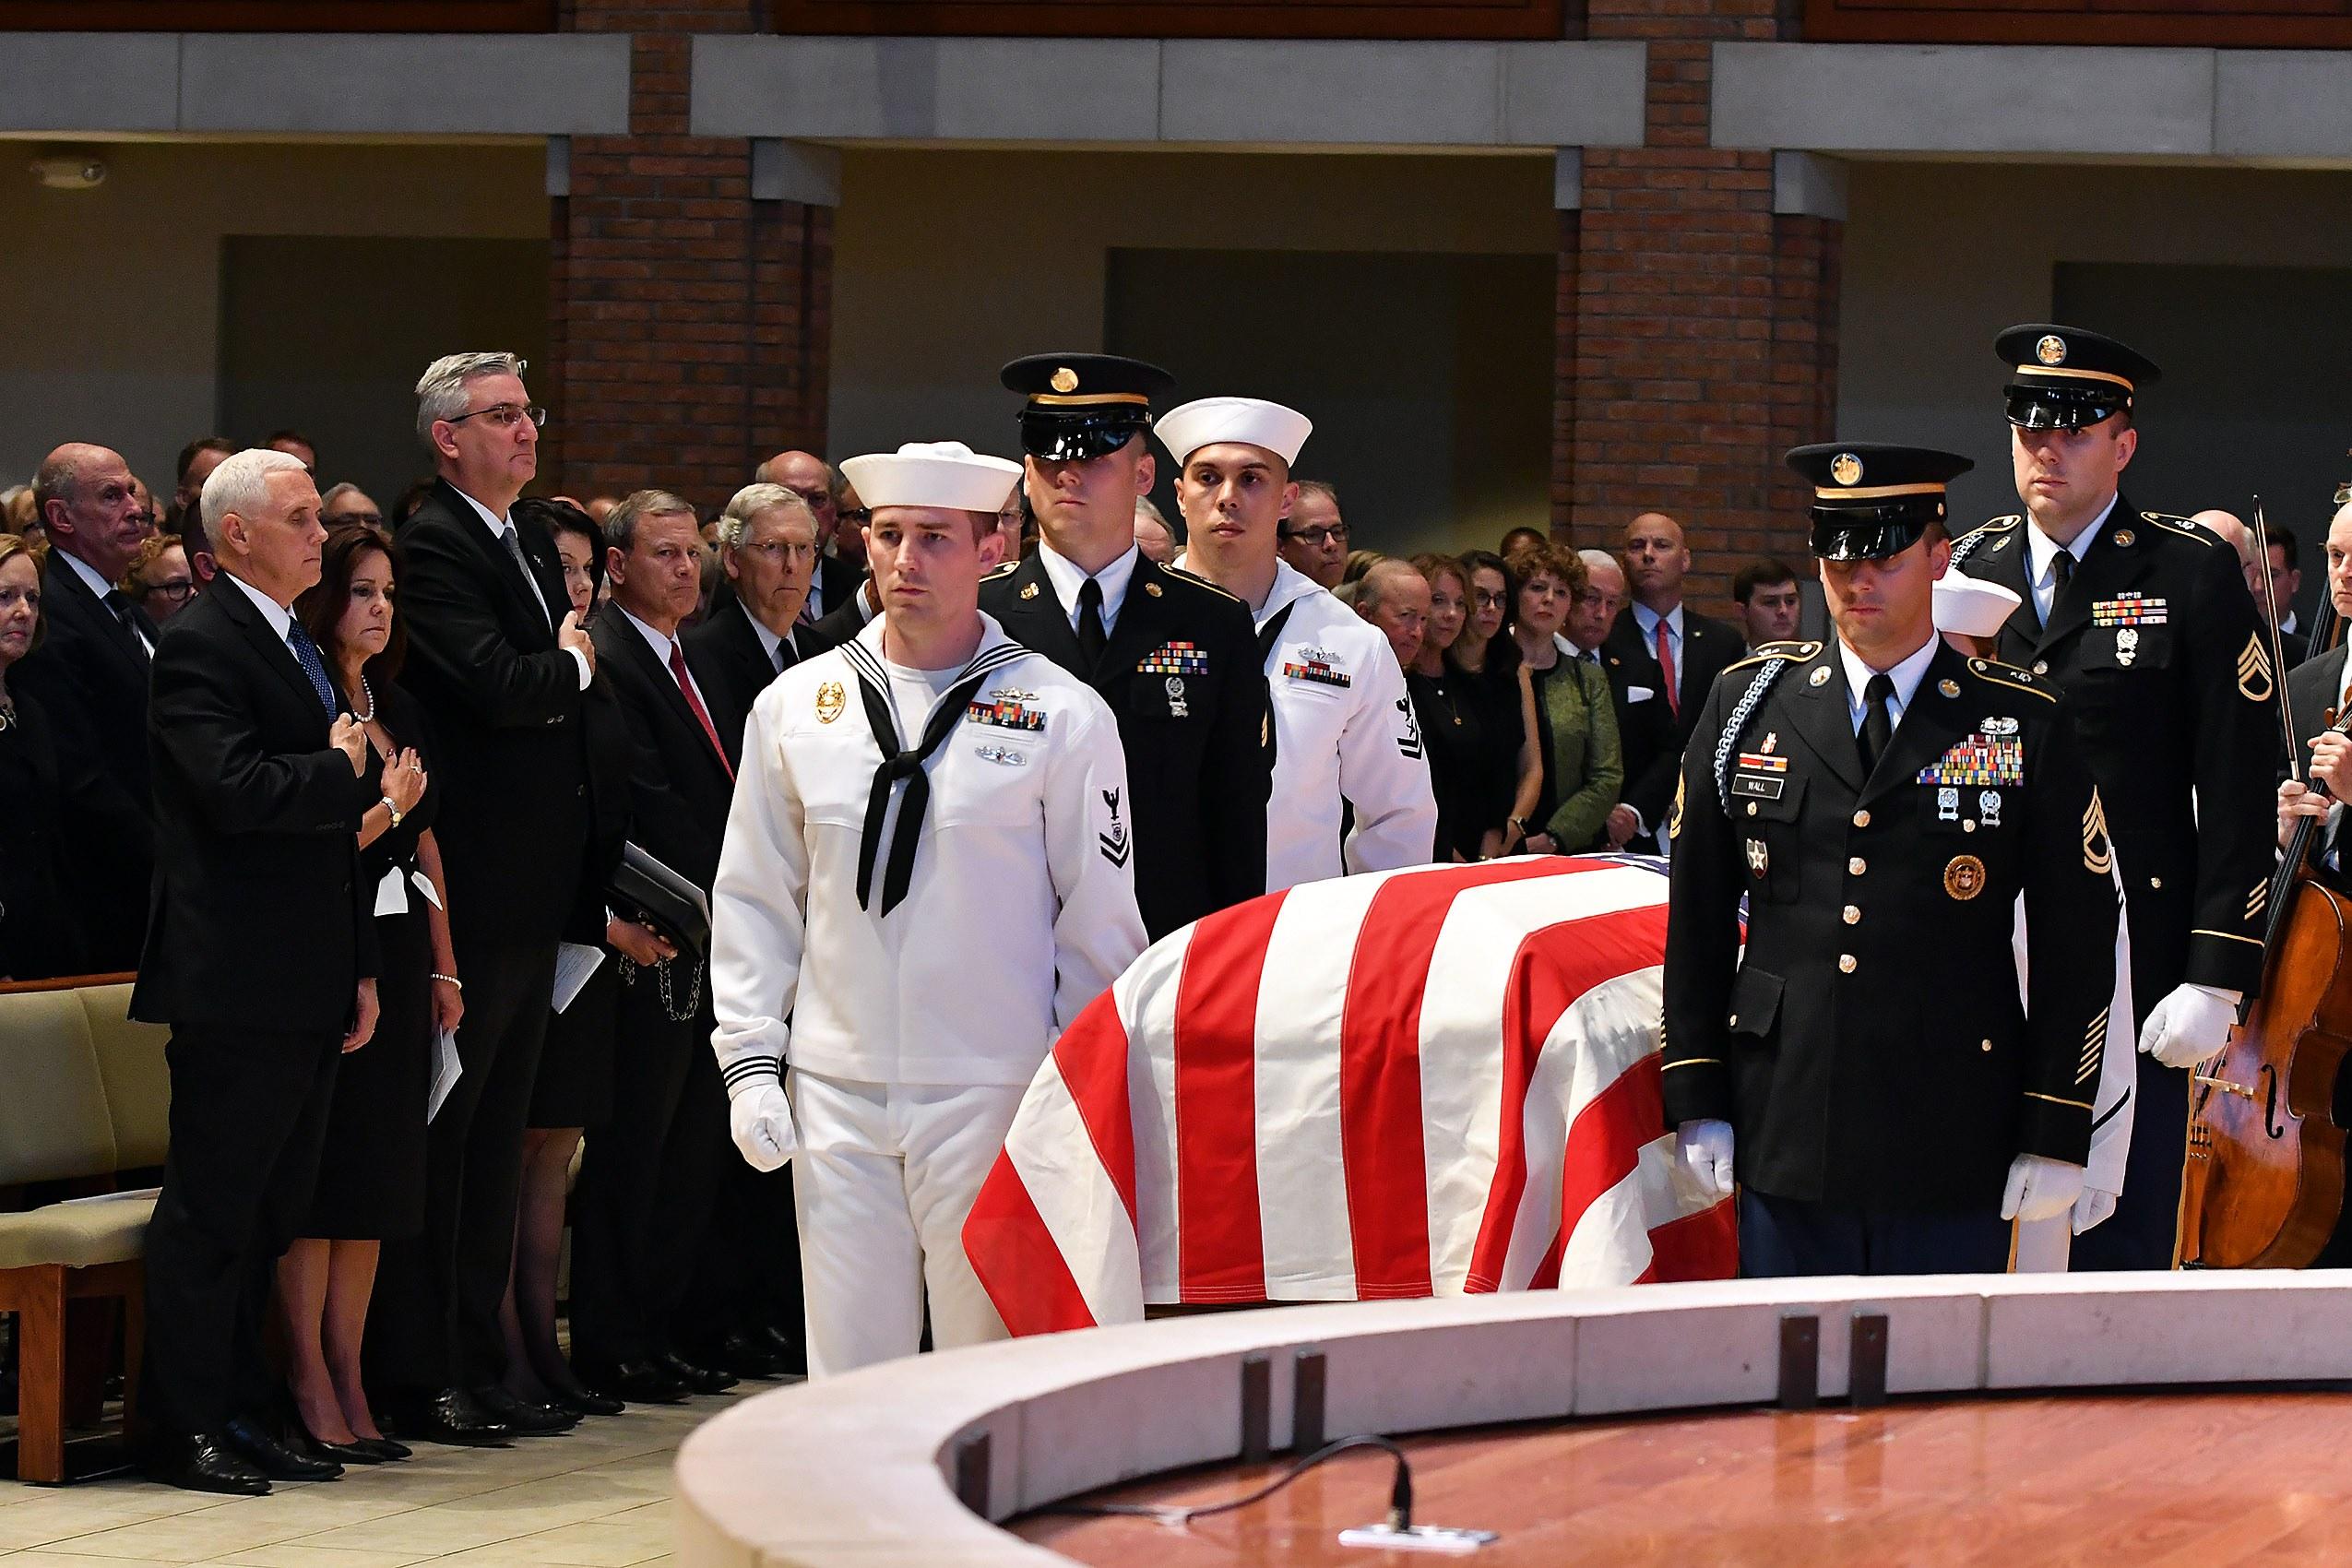 VP Pence Senator Richard Lugar memorial service May 15, 2019a0246.jpg